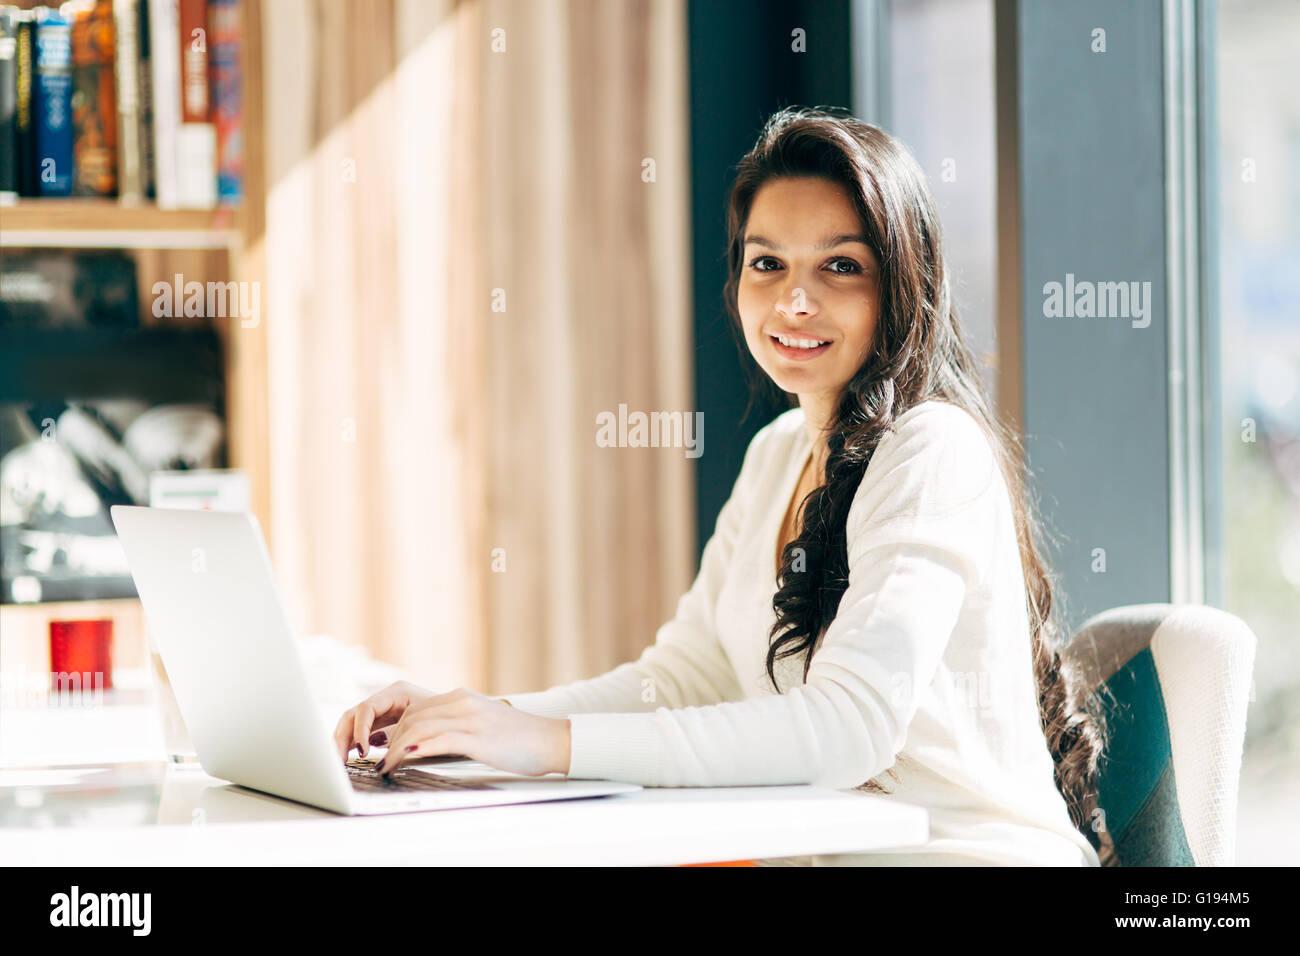 Schöne Brünette mit Notebook im café Stockbild